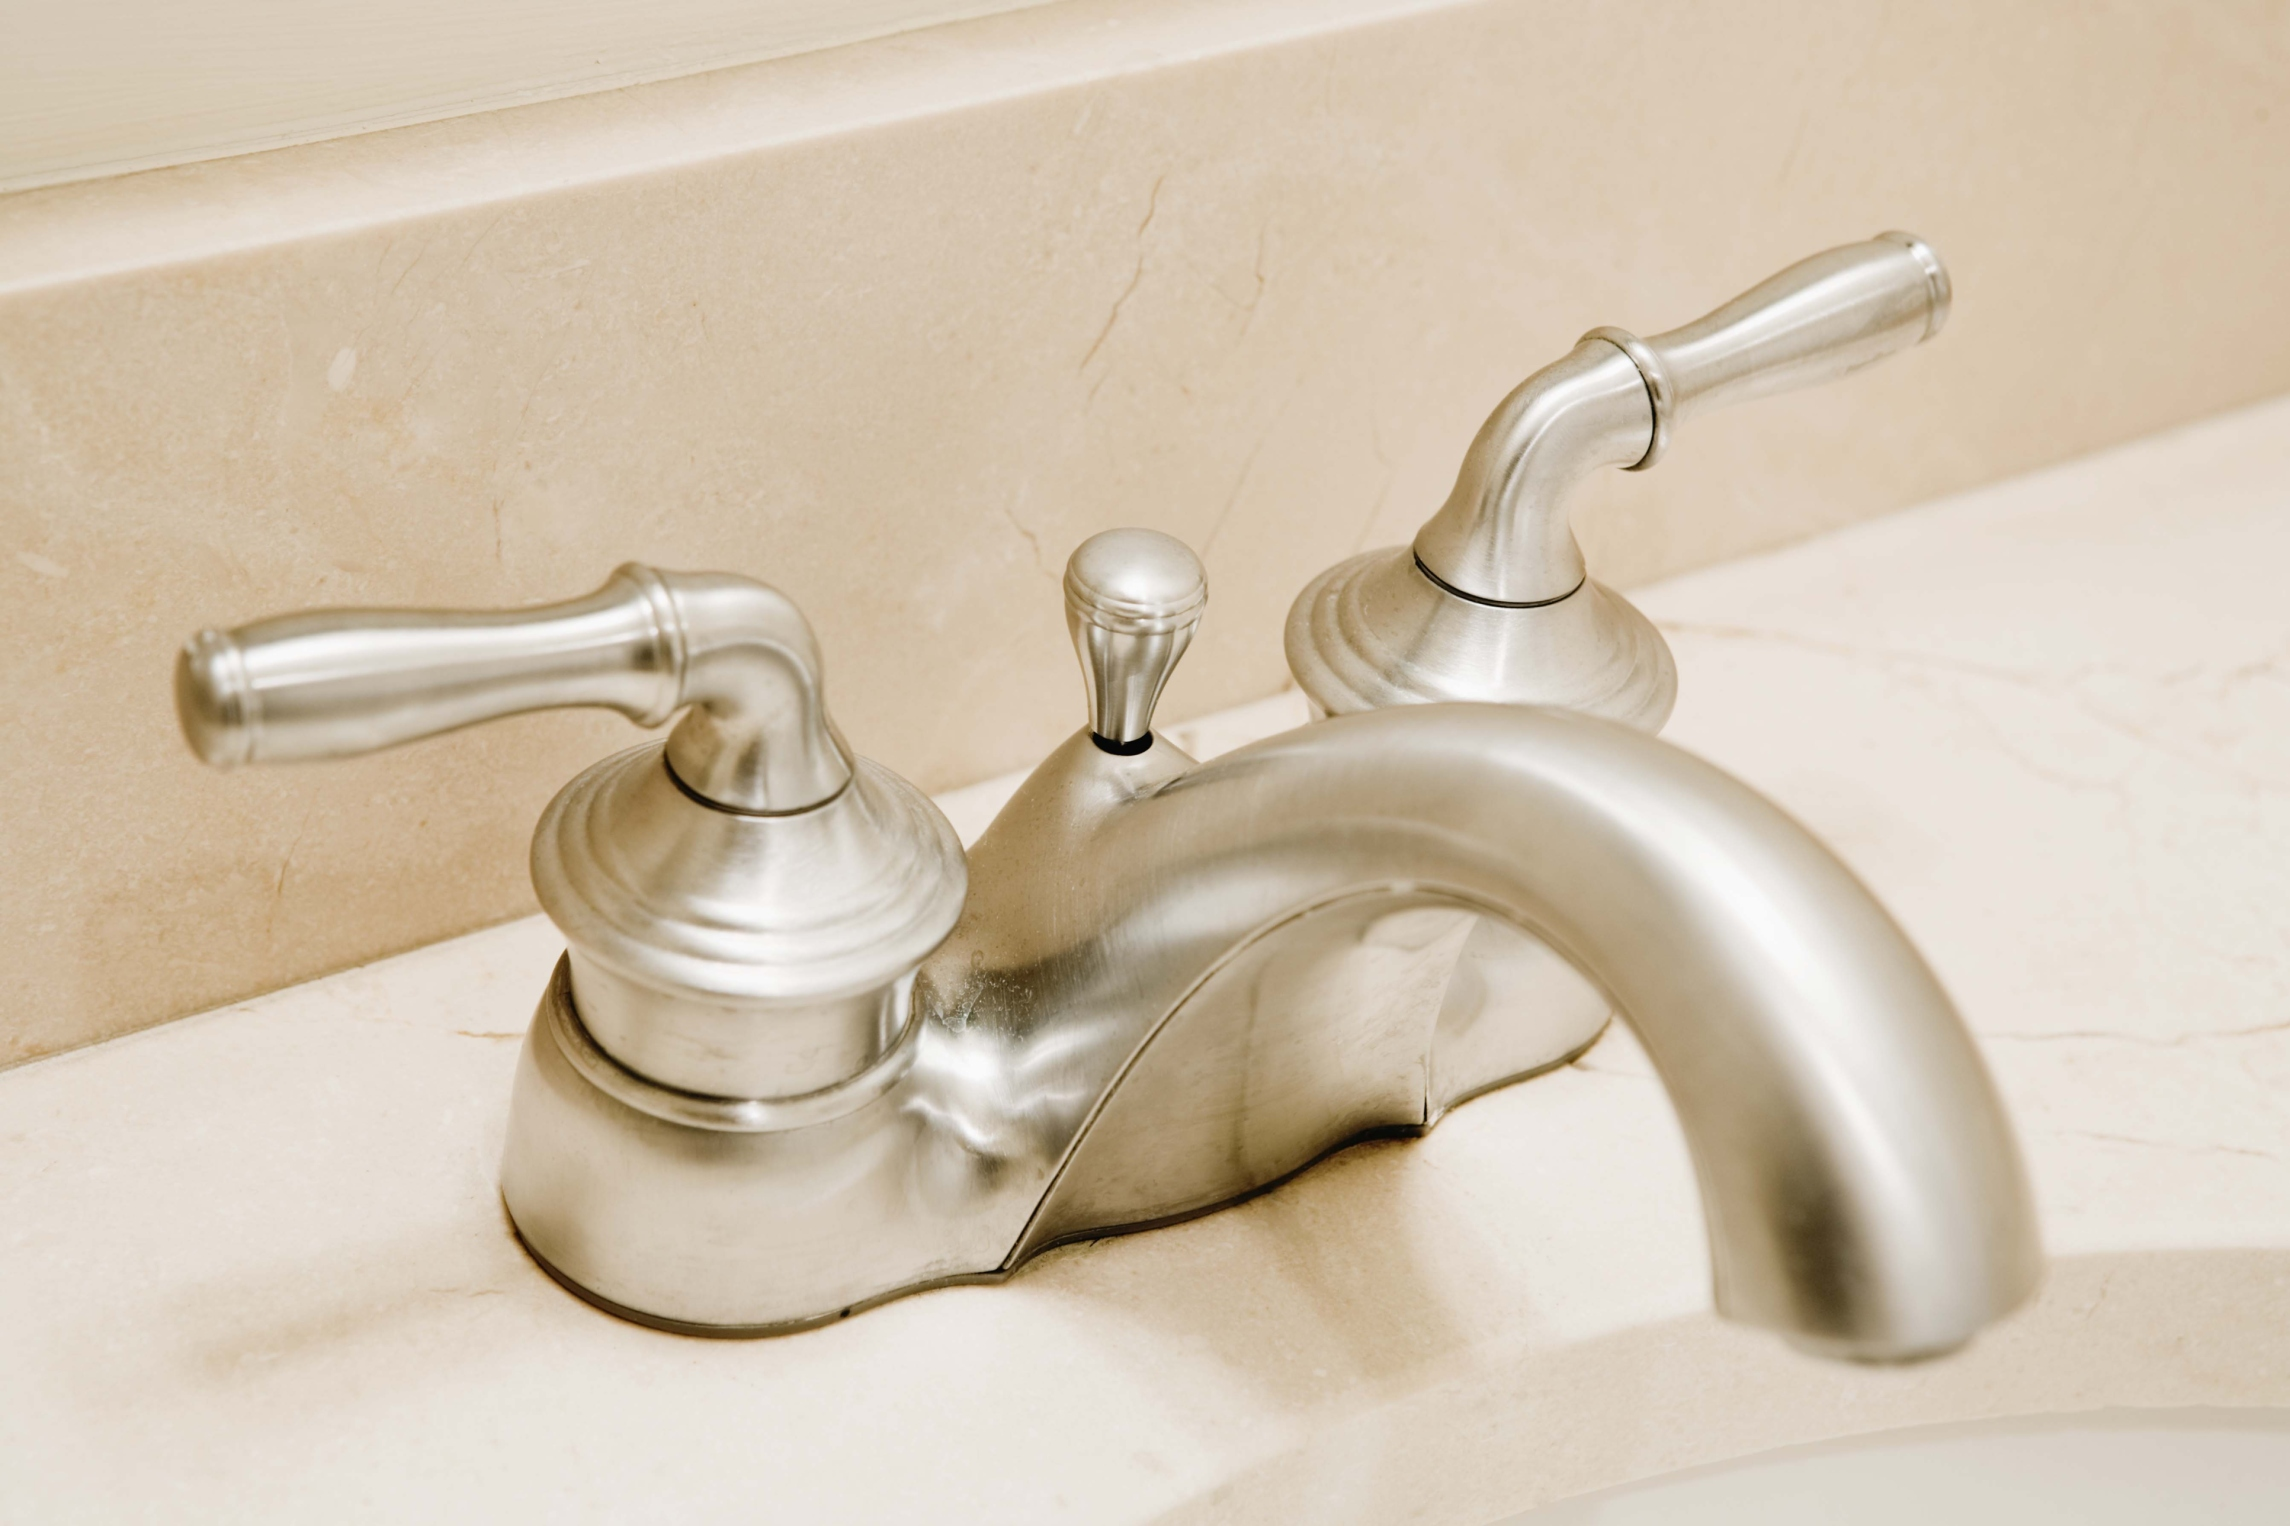 https homesteady com how 8180439 fix broken kohler faucet handle html